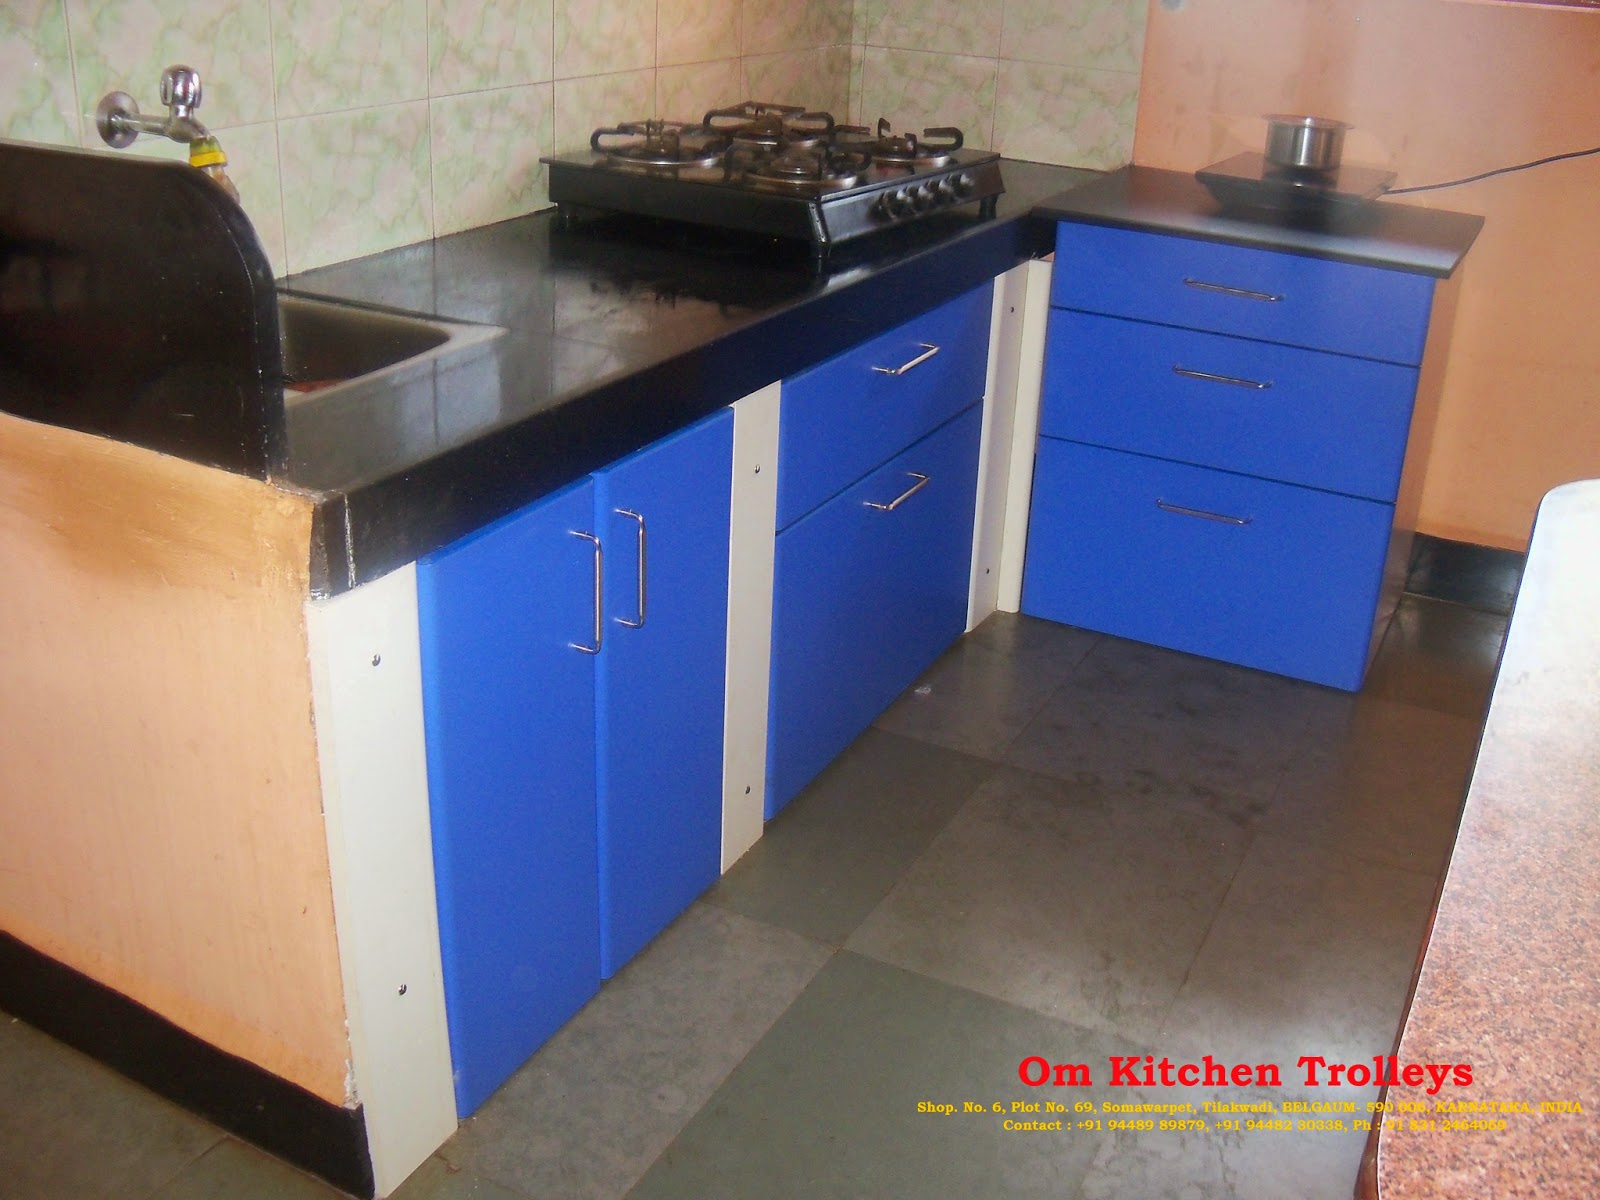 Duroflex kitchens modular kitchens amp kitchen -  Modular Kitchen Trolley By Om Kitchen Trolleys Modular Kitchen Trolleys